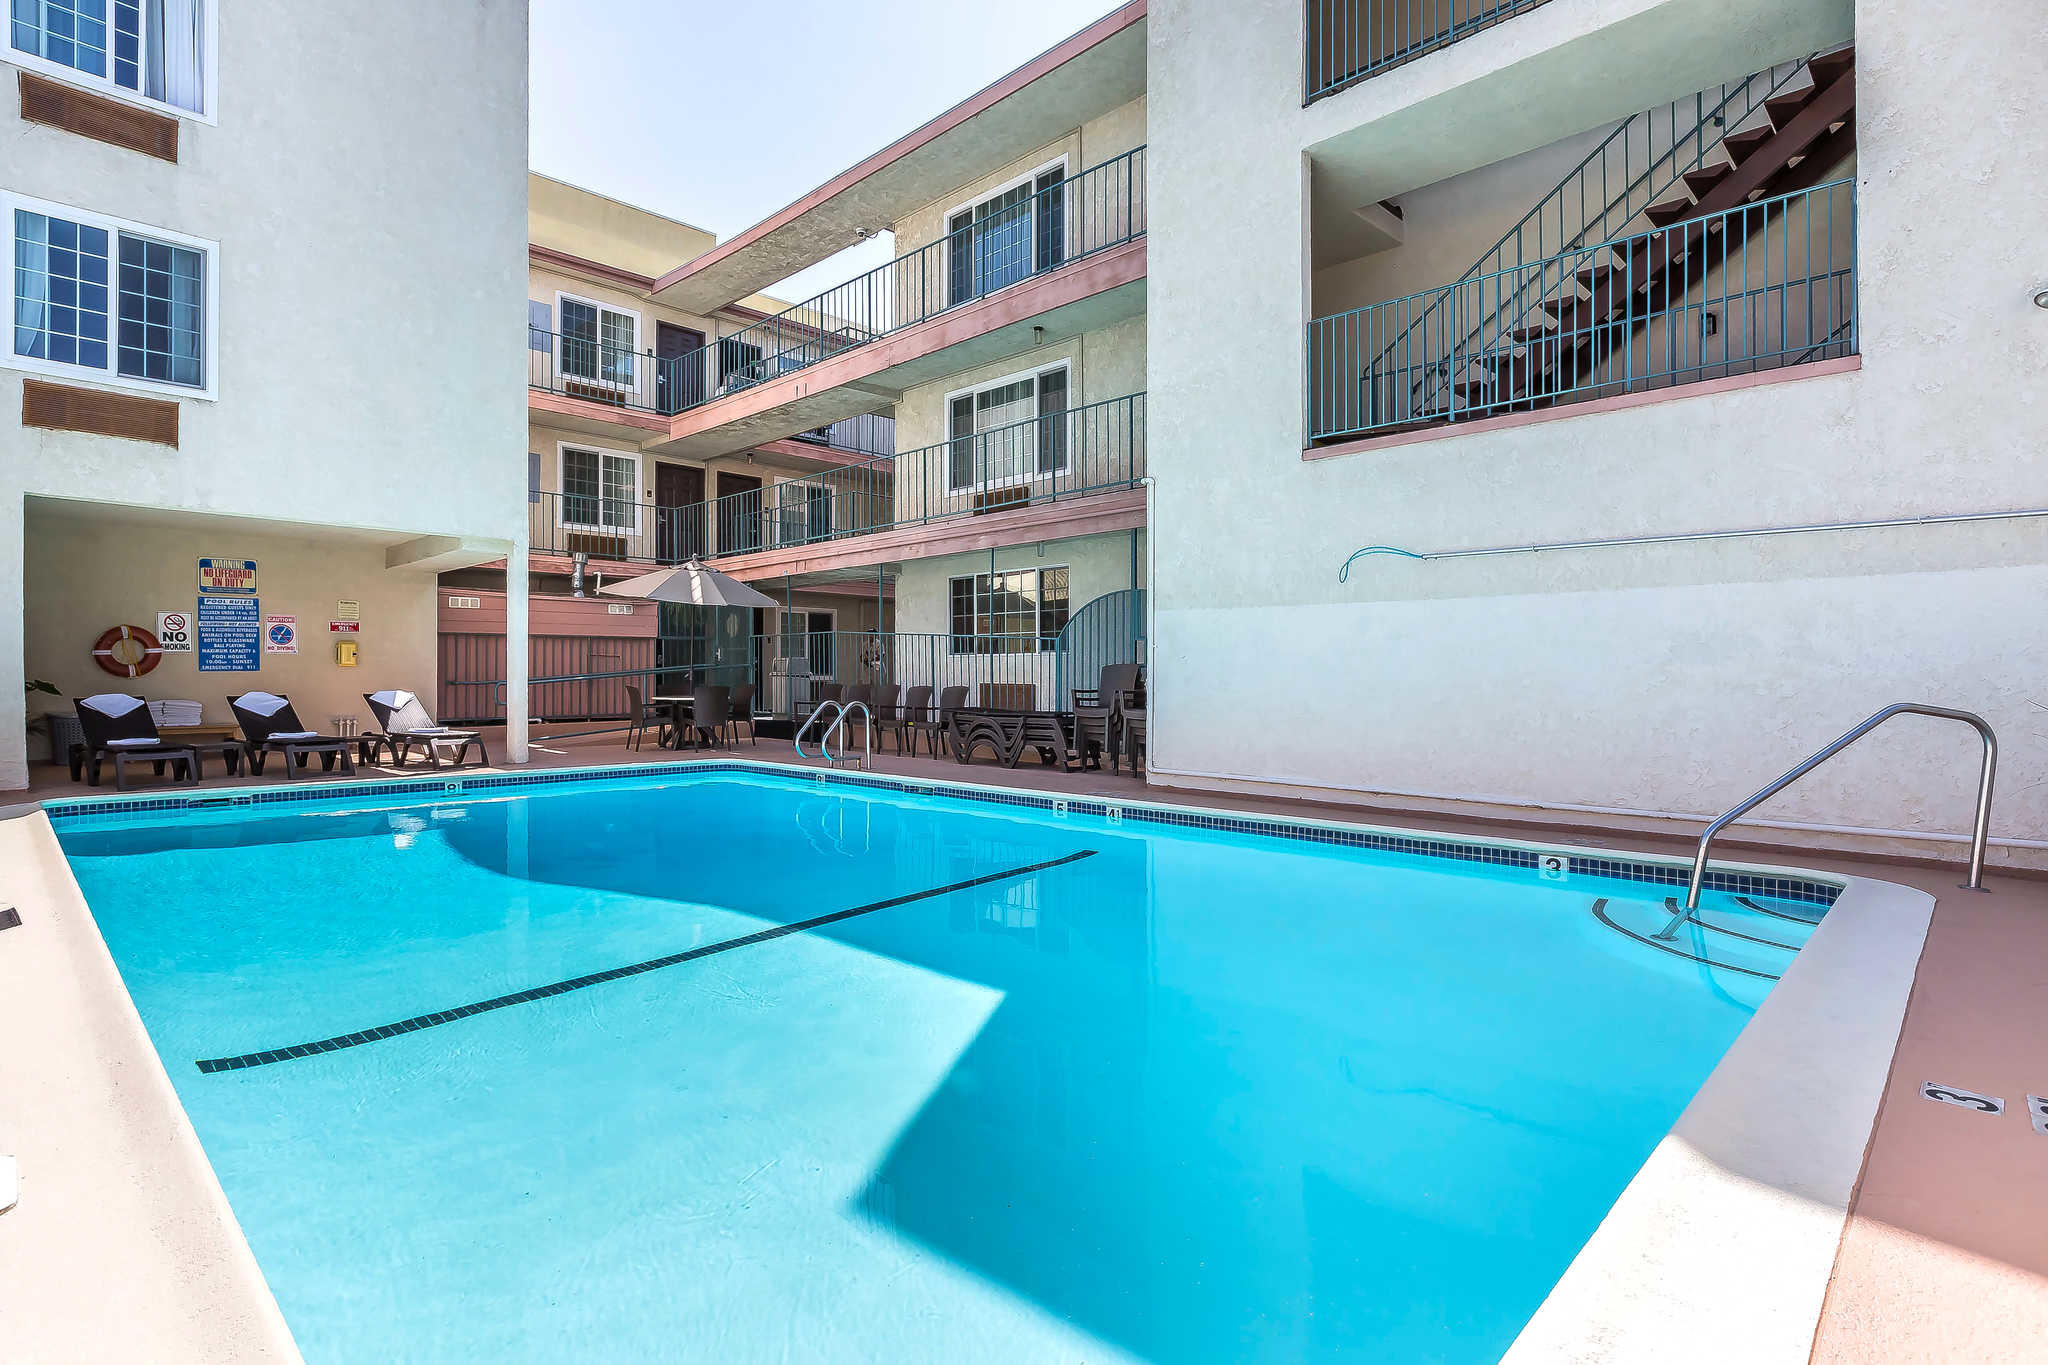 Comfort Inn Santa Monica - West Los Angeles image 42